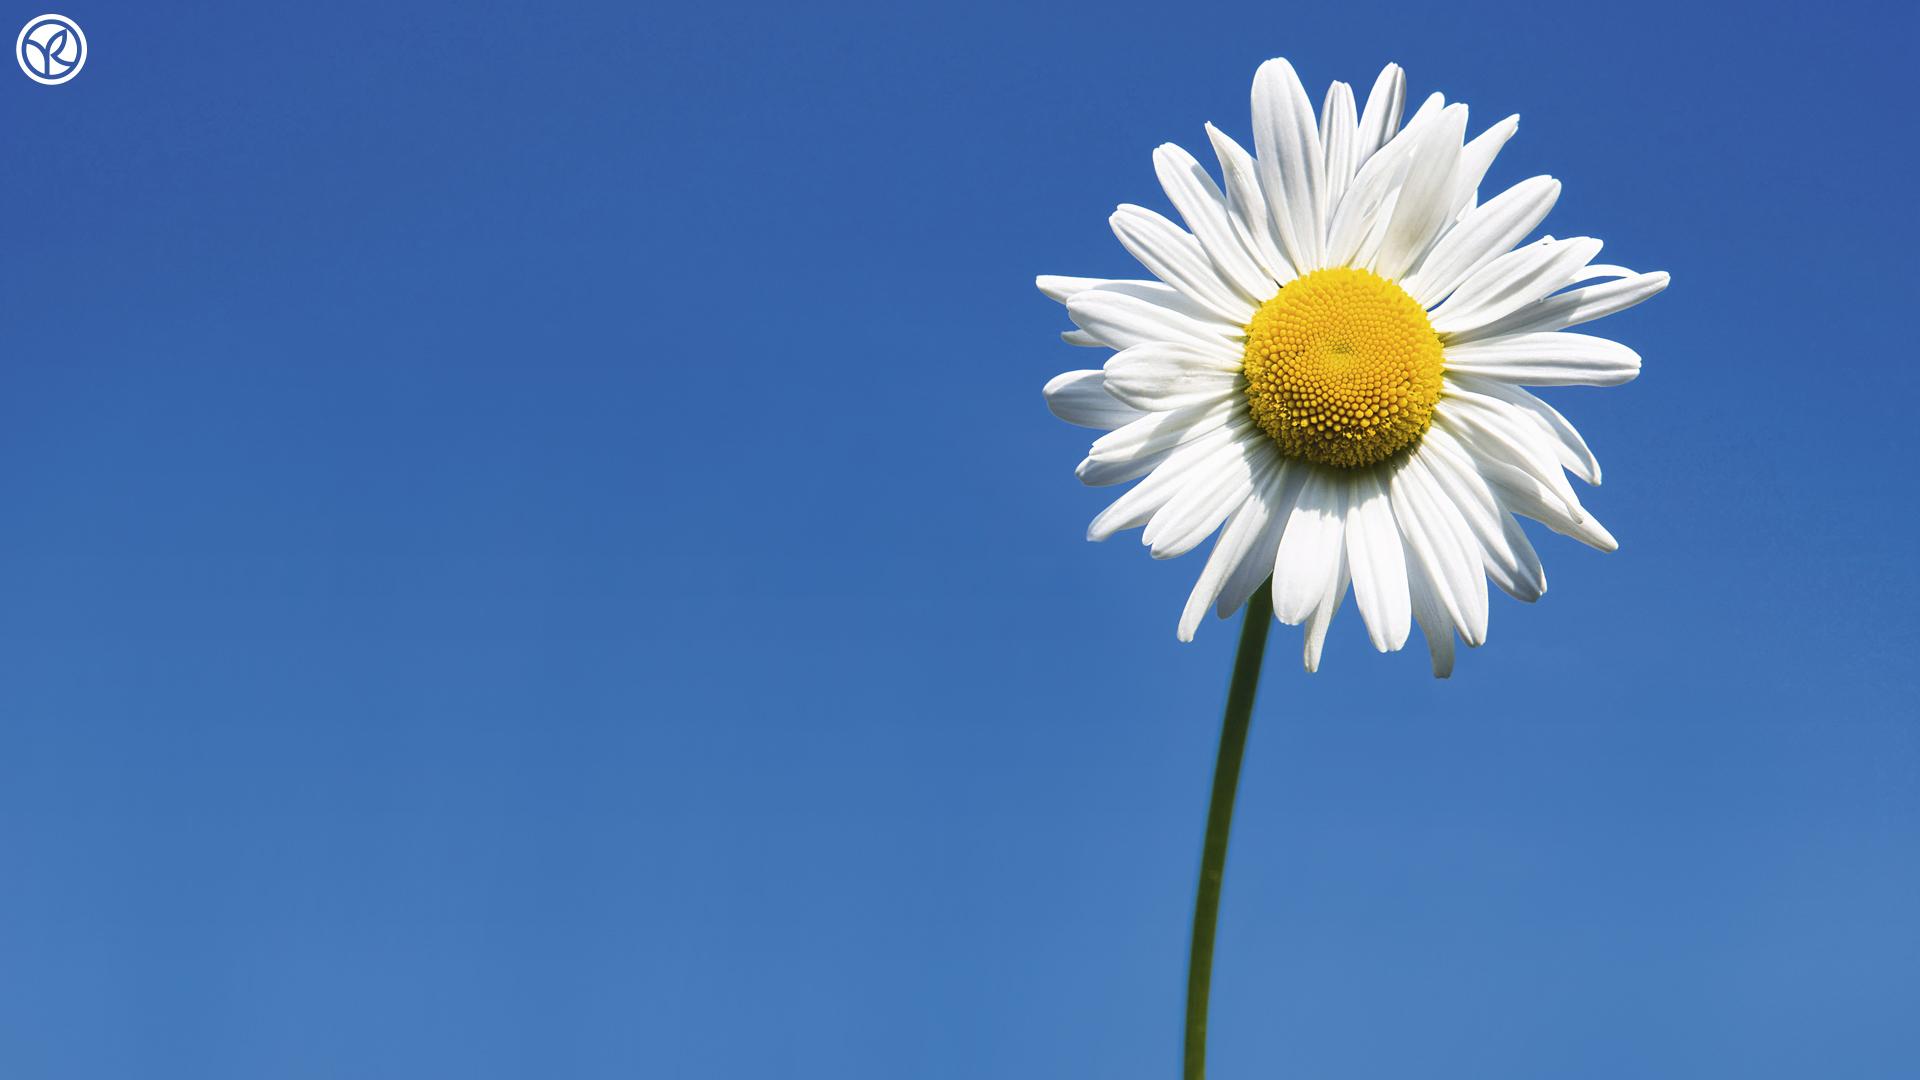 daisies wallpaper iphone 6